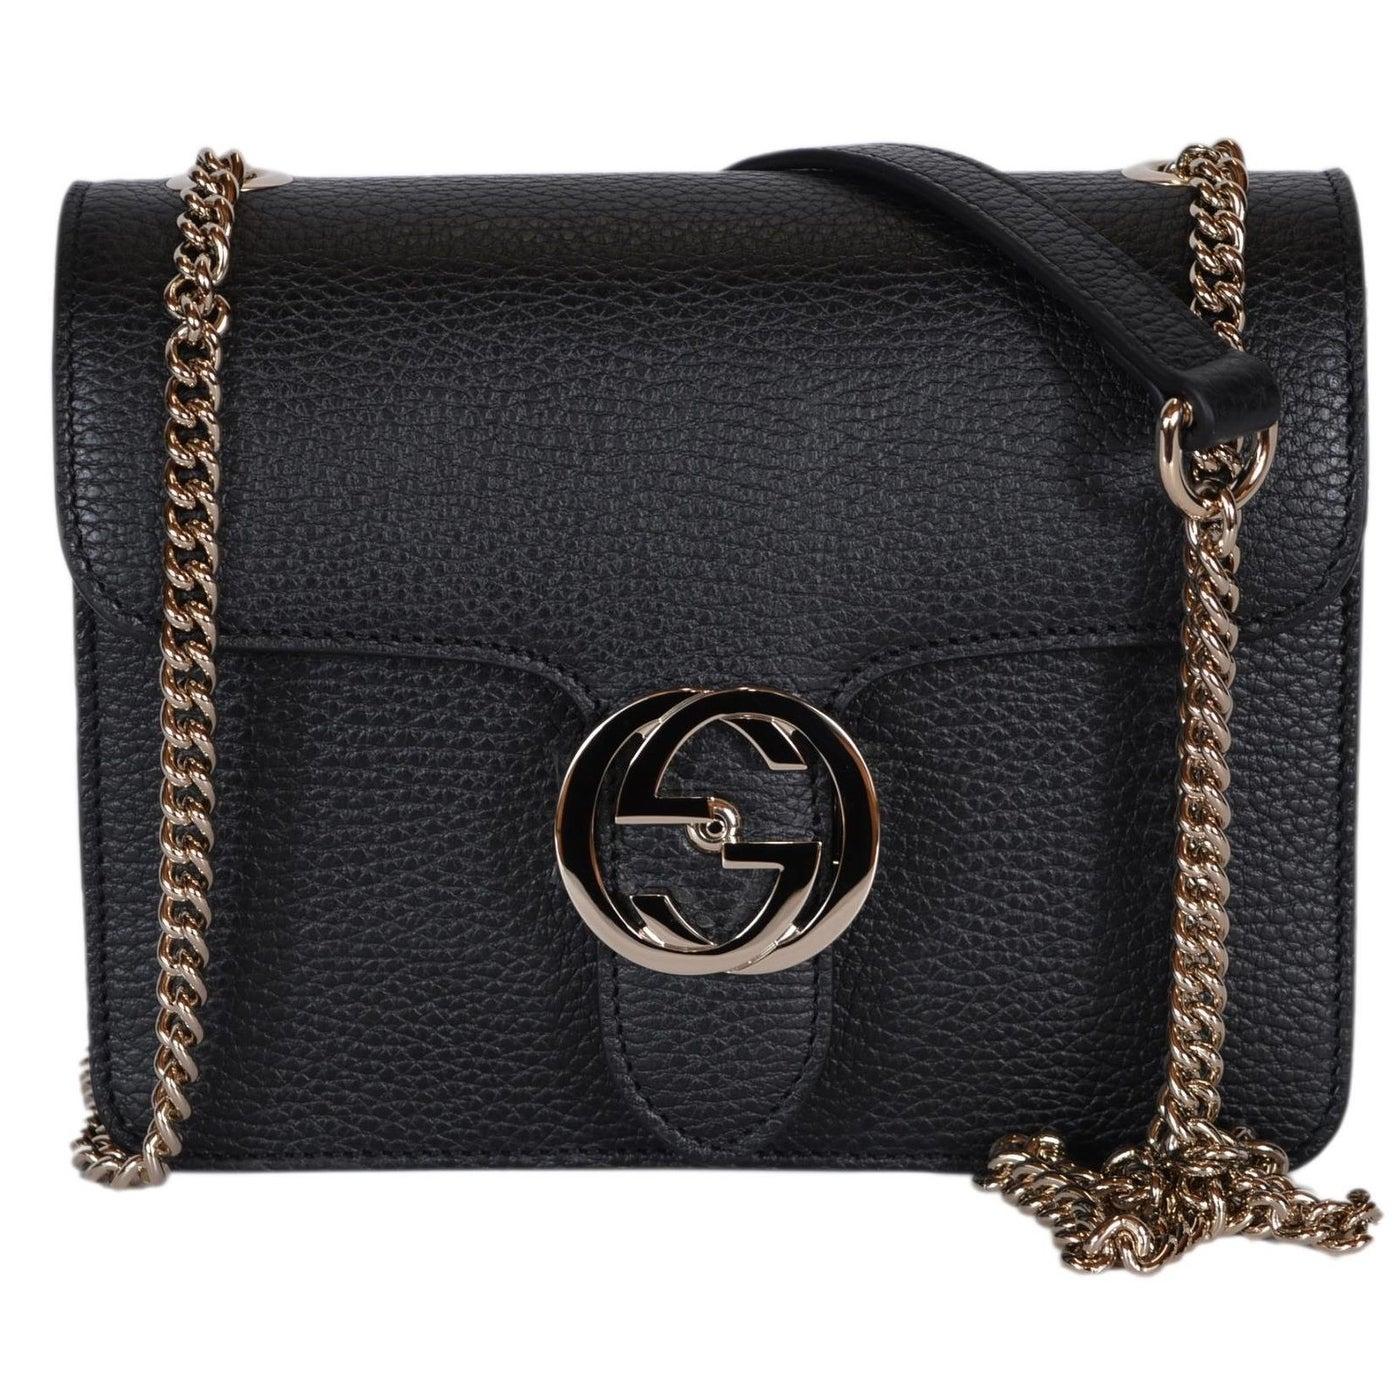 883d4b07d64c Gucci Women's Black Leather 510304 Interlocking GG Crossbody Purse Handbag  - 7.75